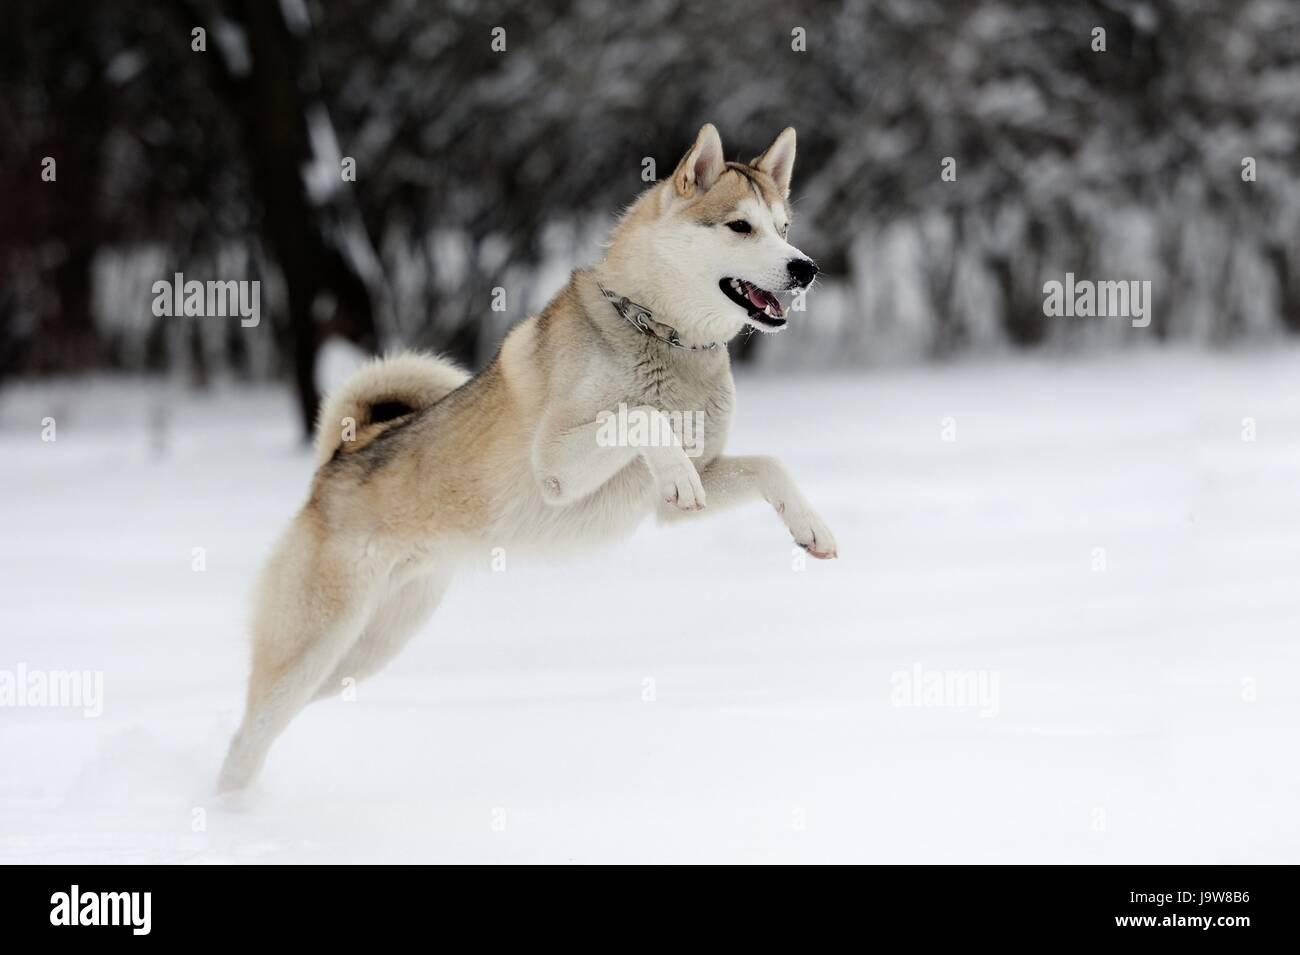 Young Siberian Husky Dog In Snow Stock Photo 143770234 Alamy